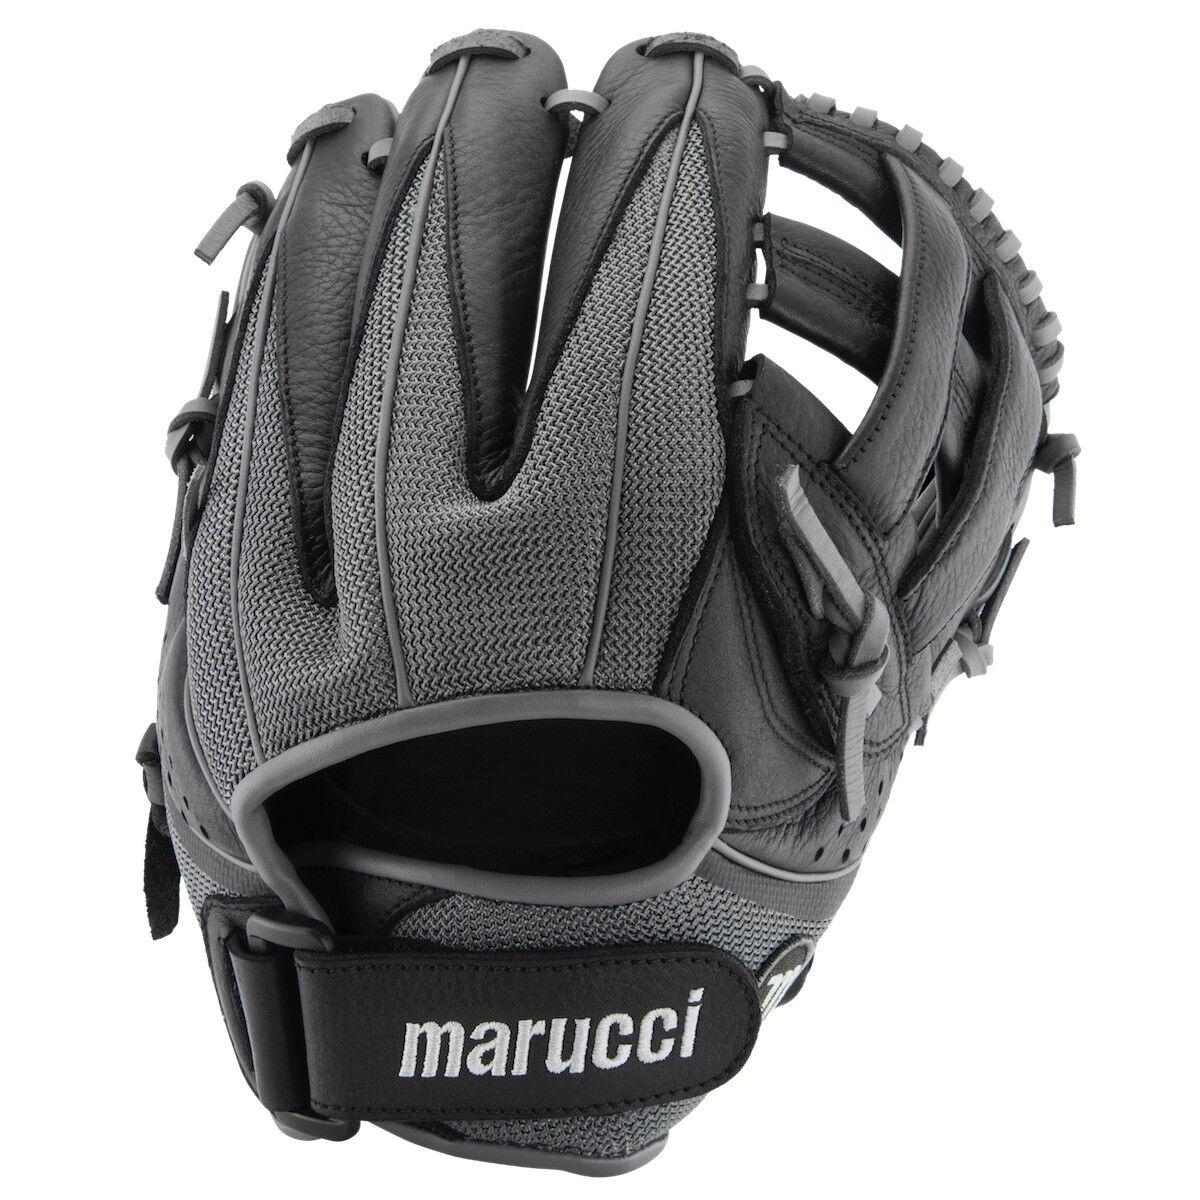 Marucci Geaux Mesh Series MFGGXM115H-GY/BK 11.5